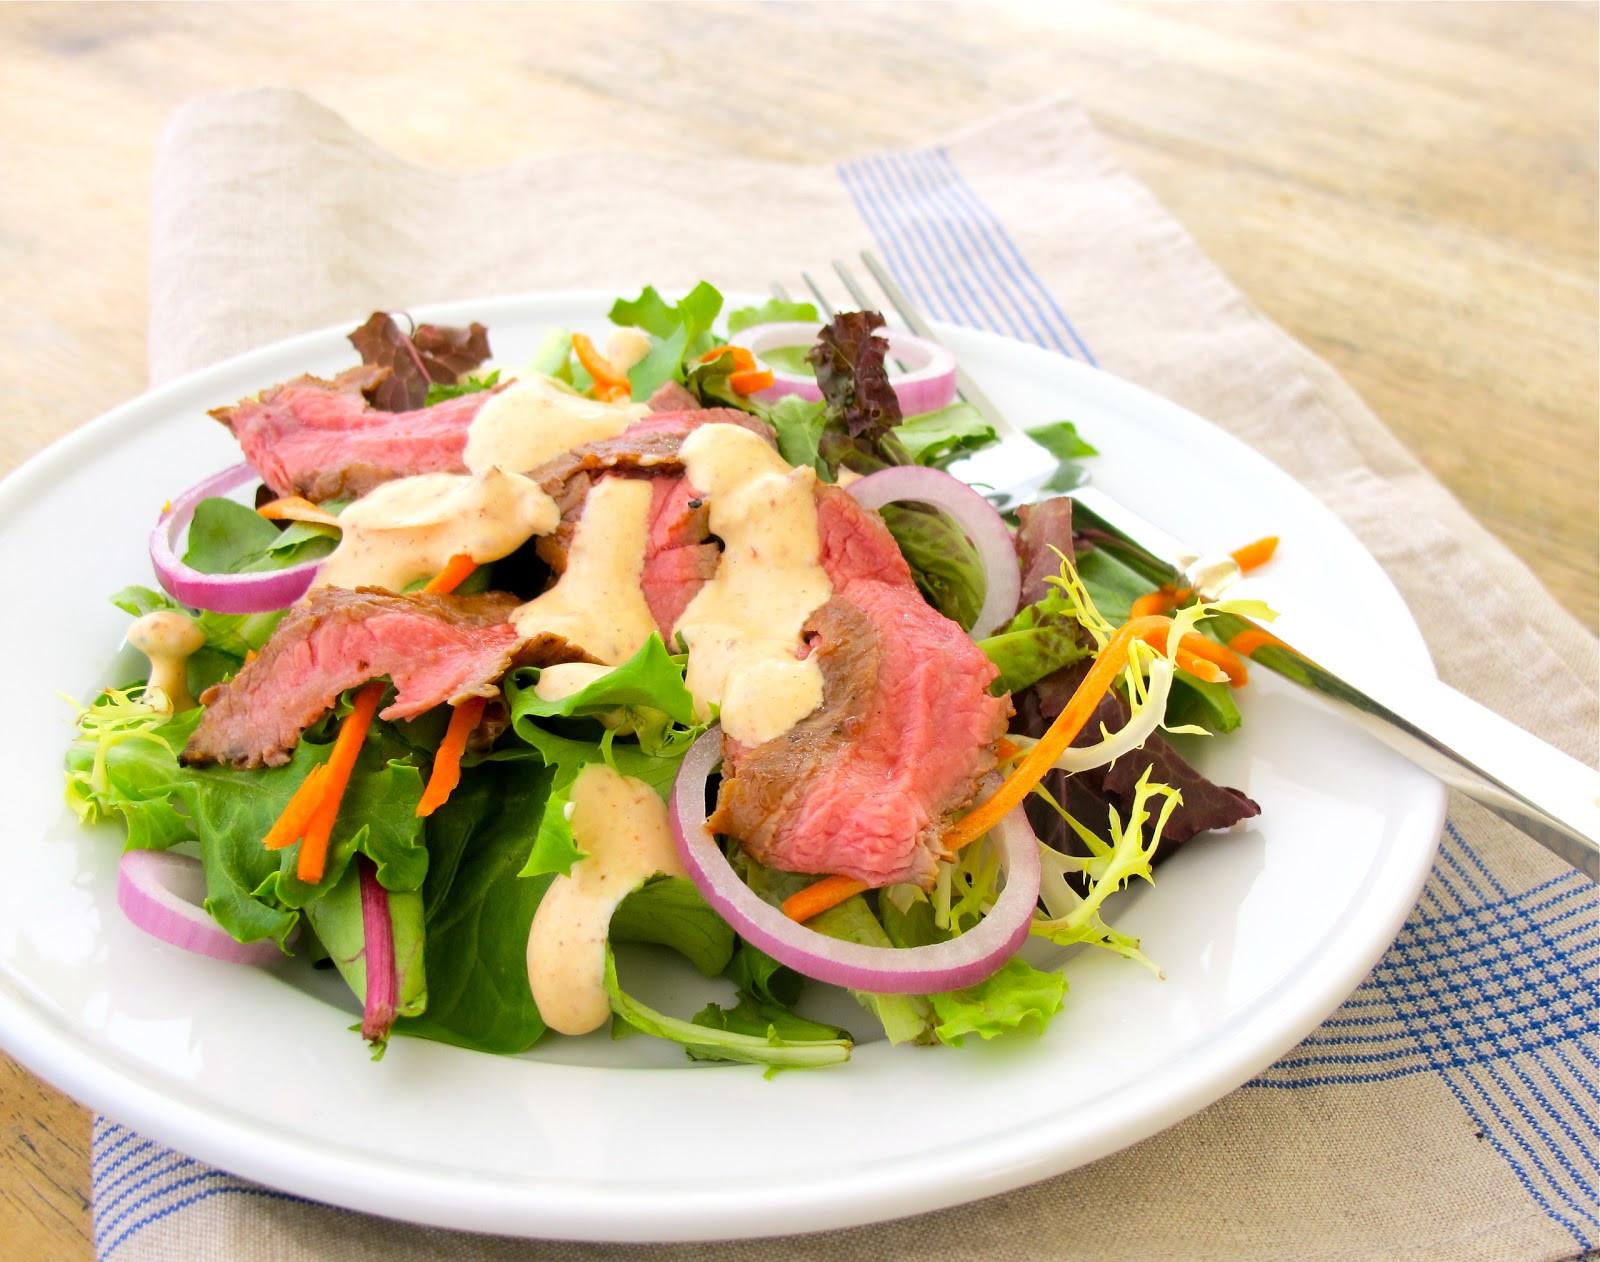 Light Summer Dinners  Jenny Steffens Hobick Chipotle Grilled Steak Salad